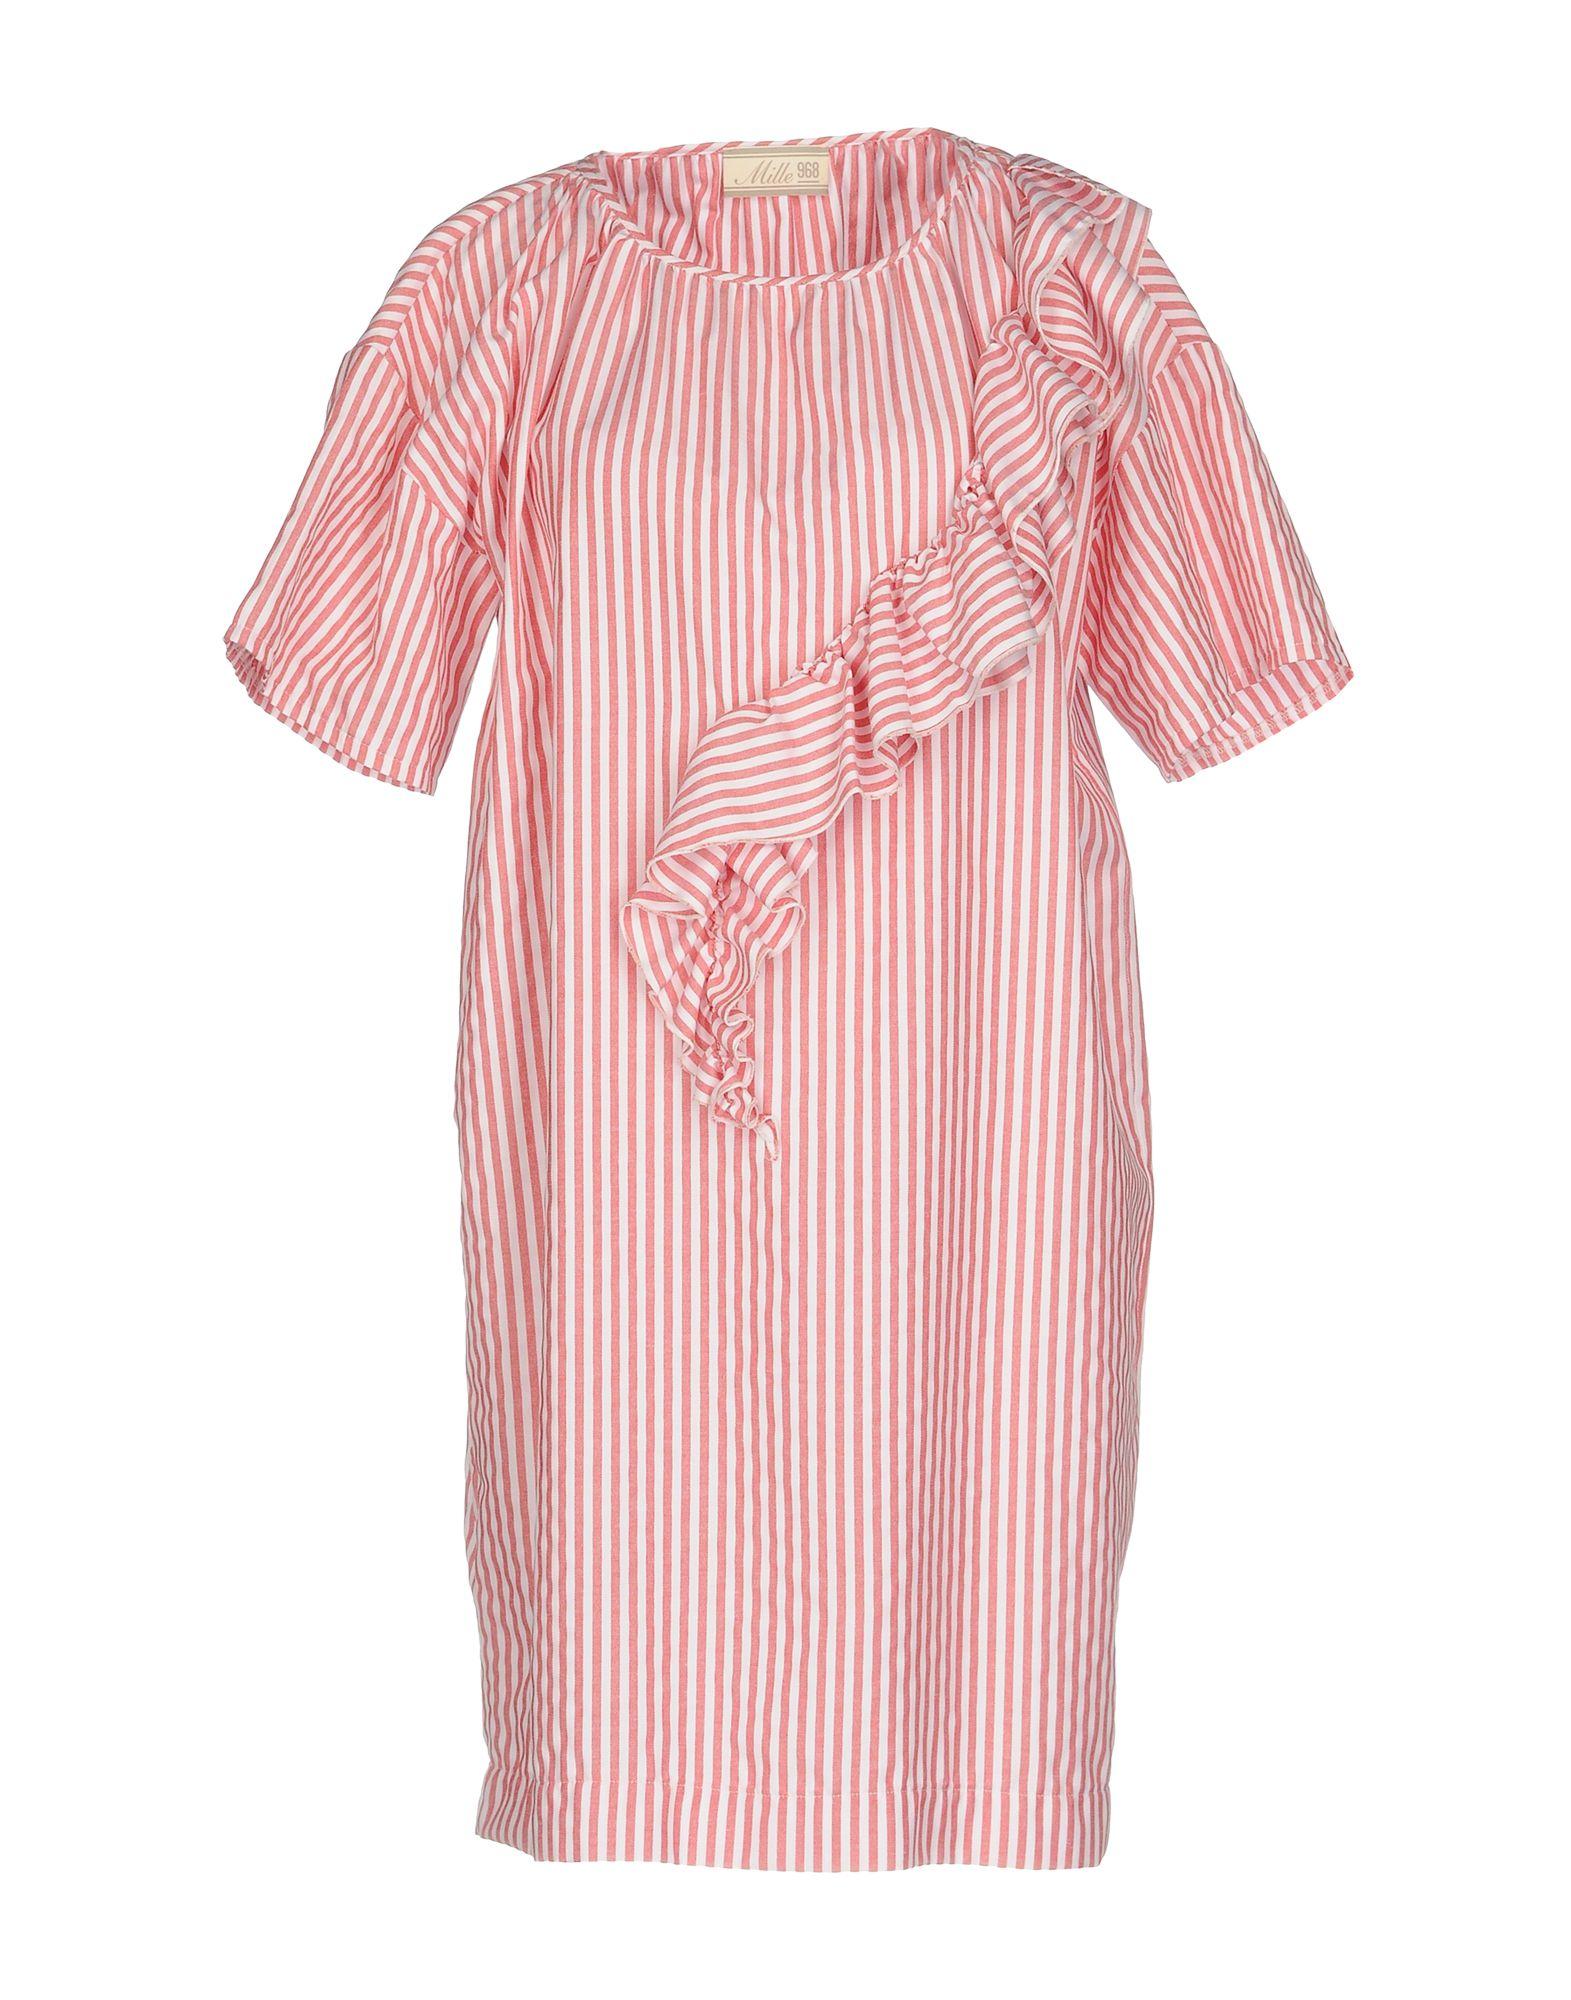 MILLE 968 Короткое платье фреза cmt 968 127 11